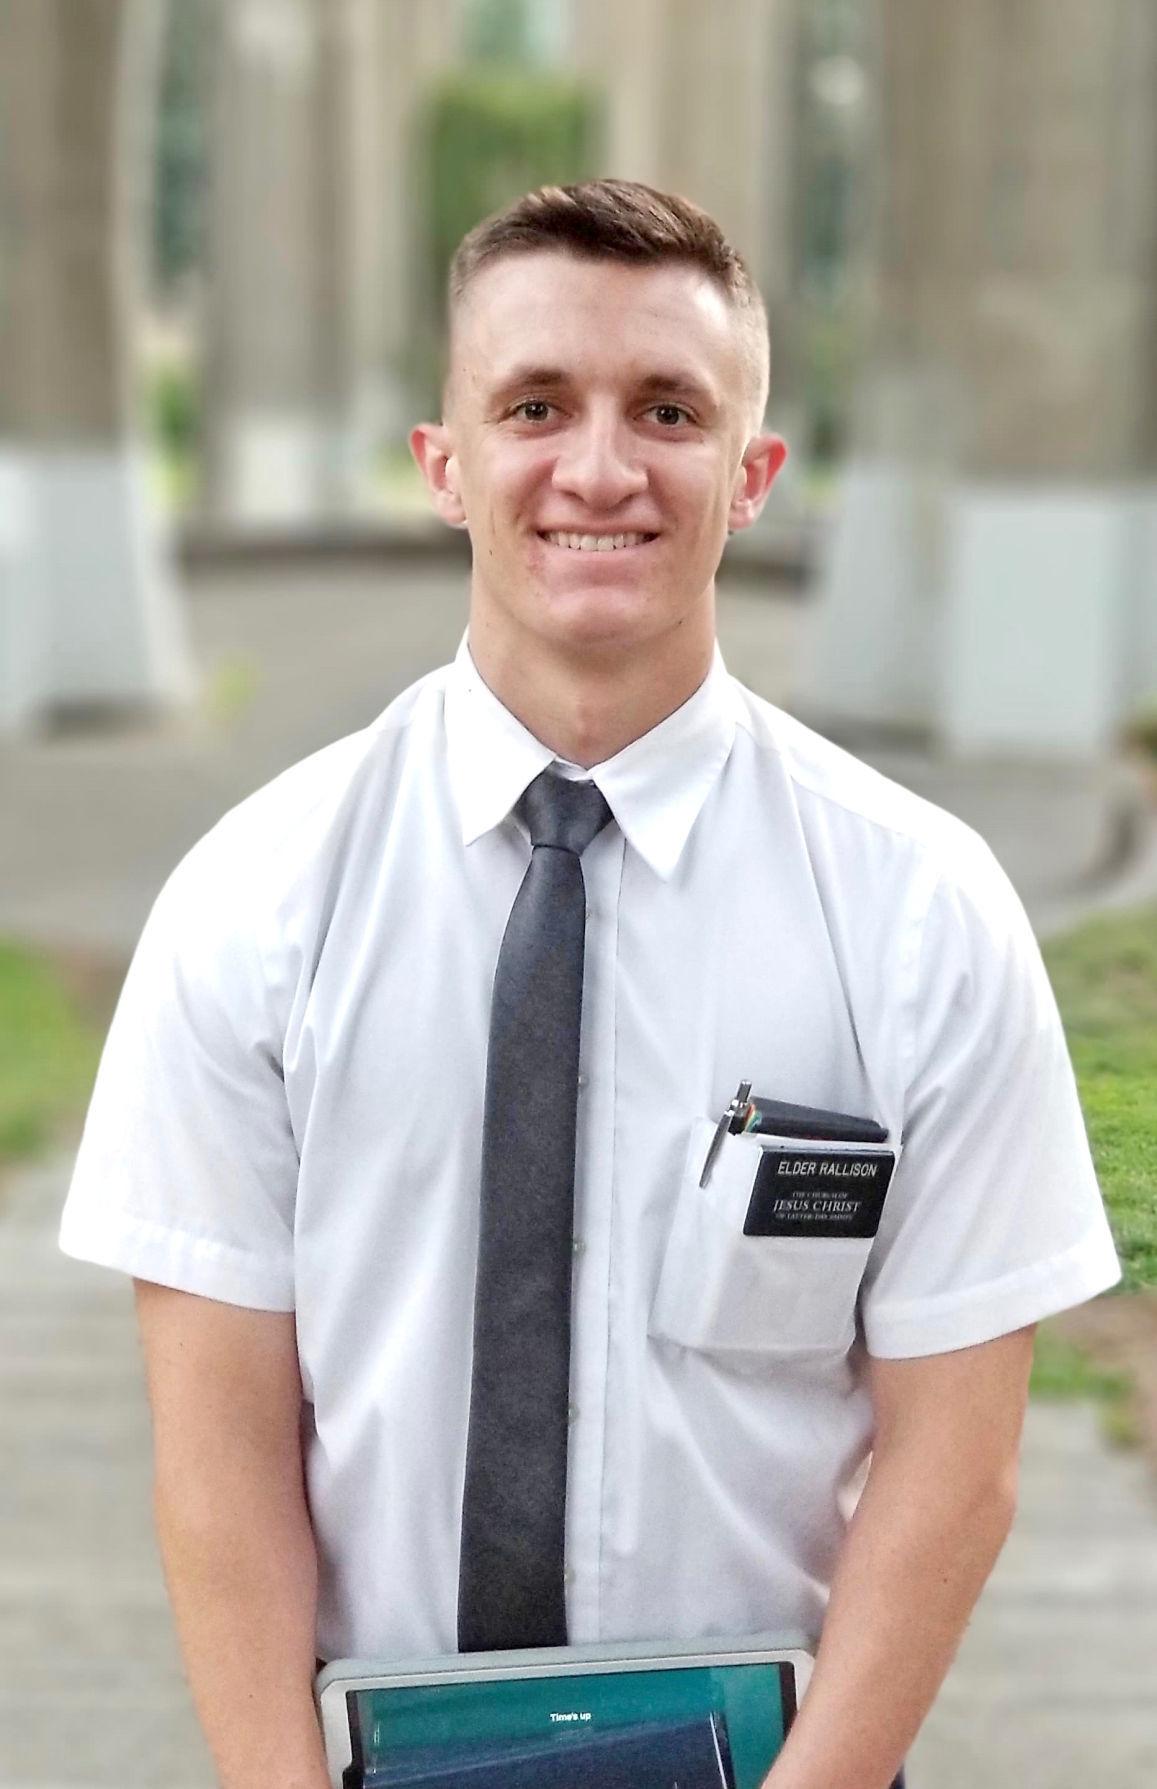 Elder Matthew Rallison